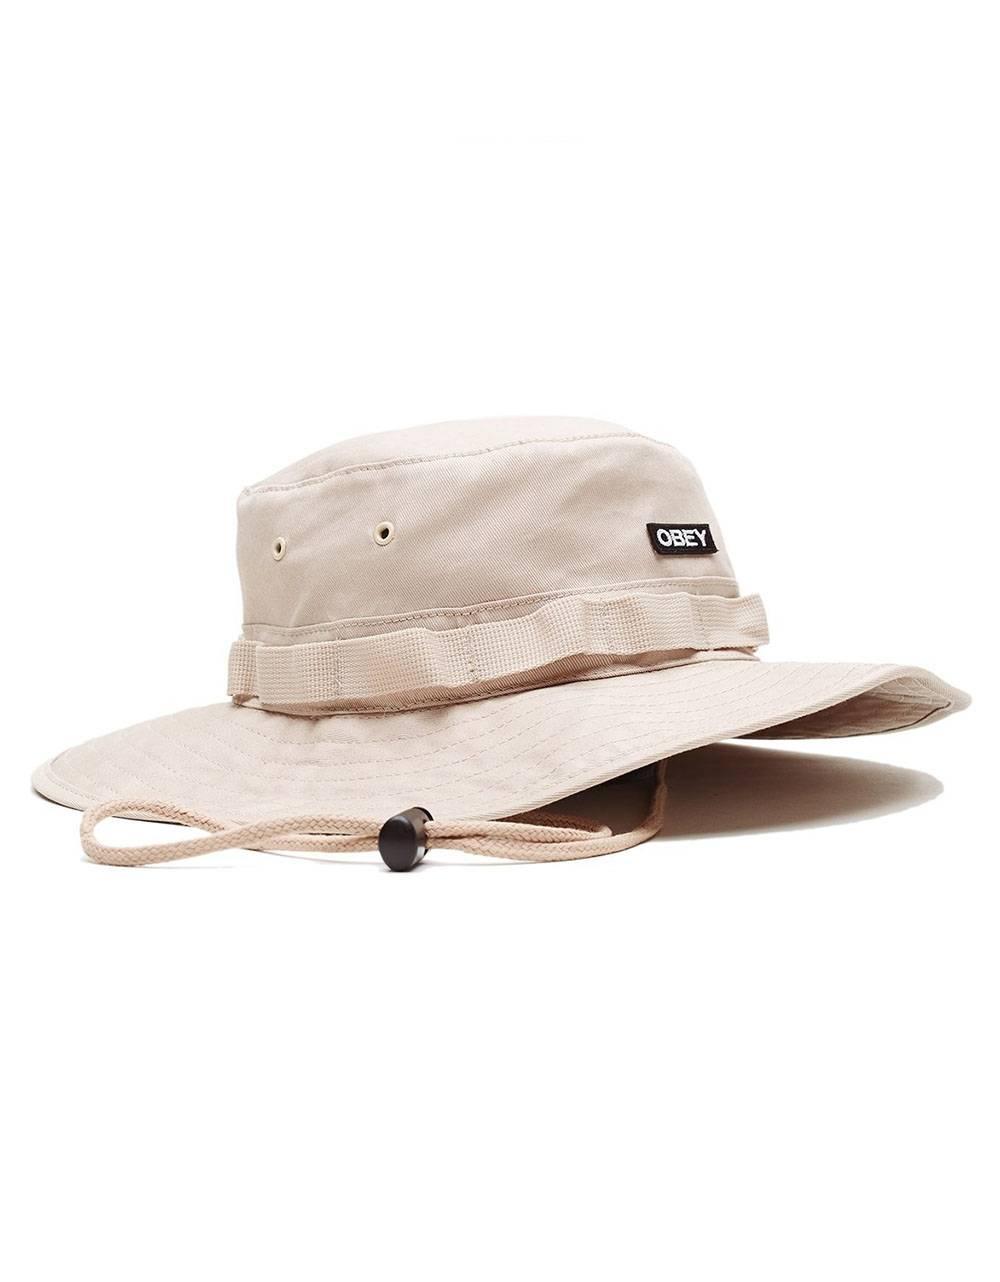 Obey river boonie hat - khaki obey Hat 40,98€